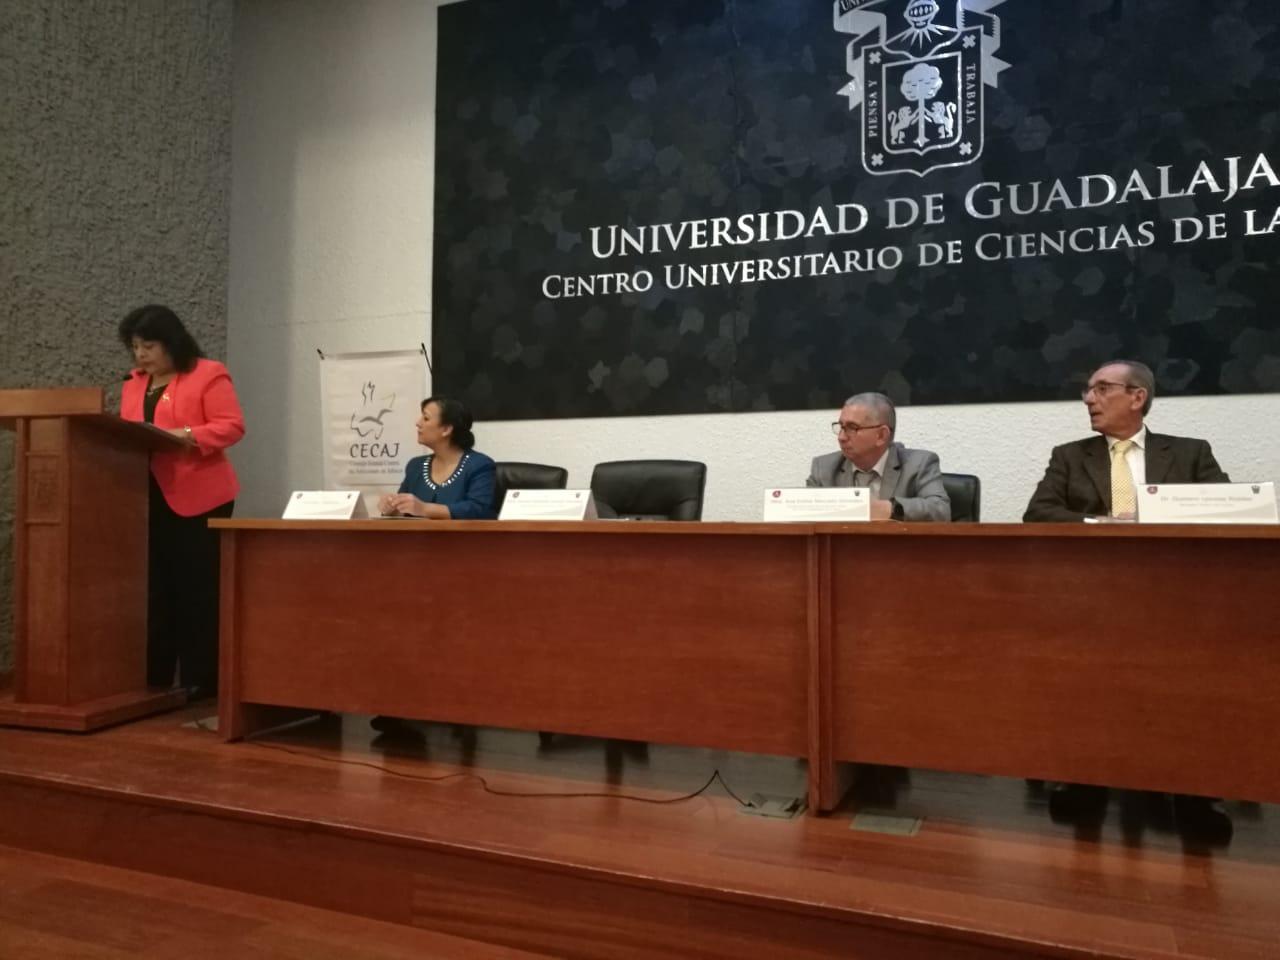 Dra Sandra Lecona al micrófono en el podio